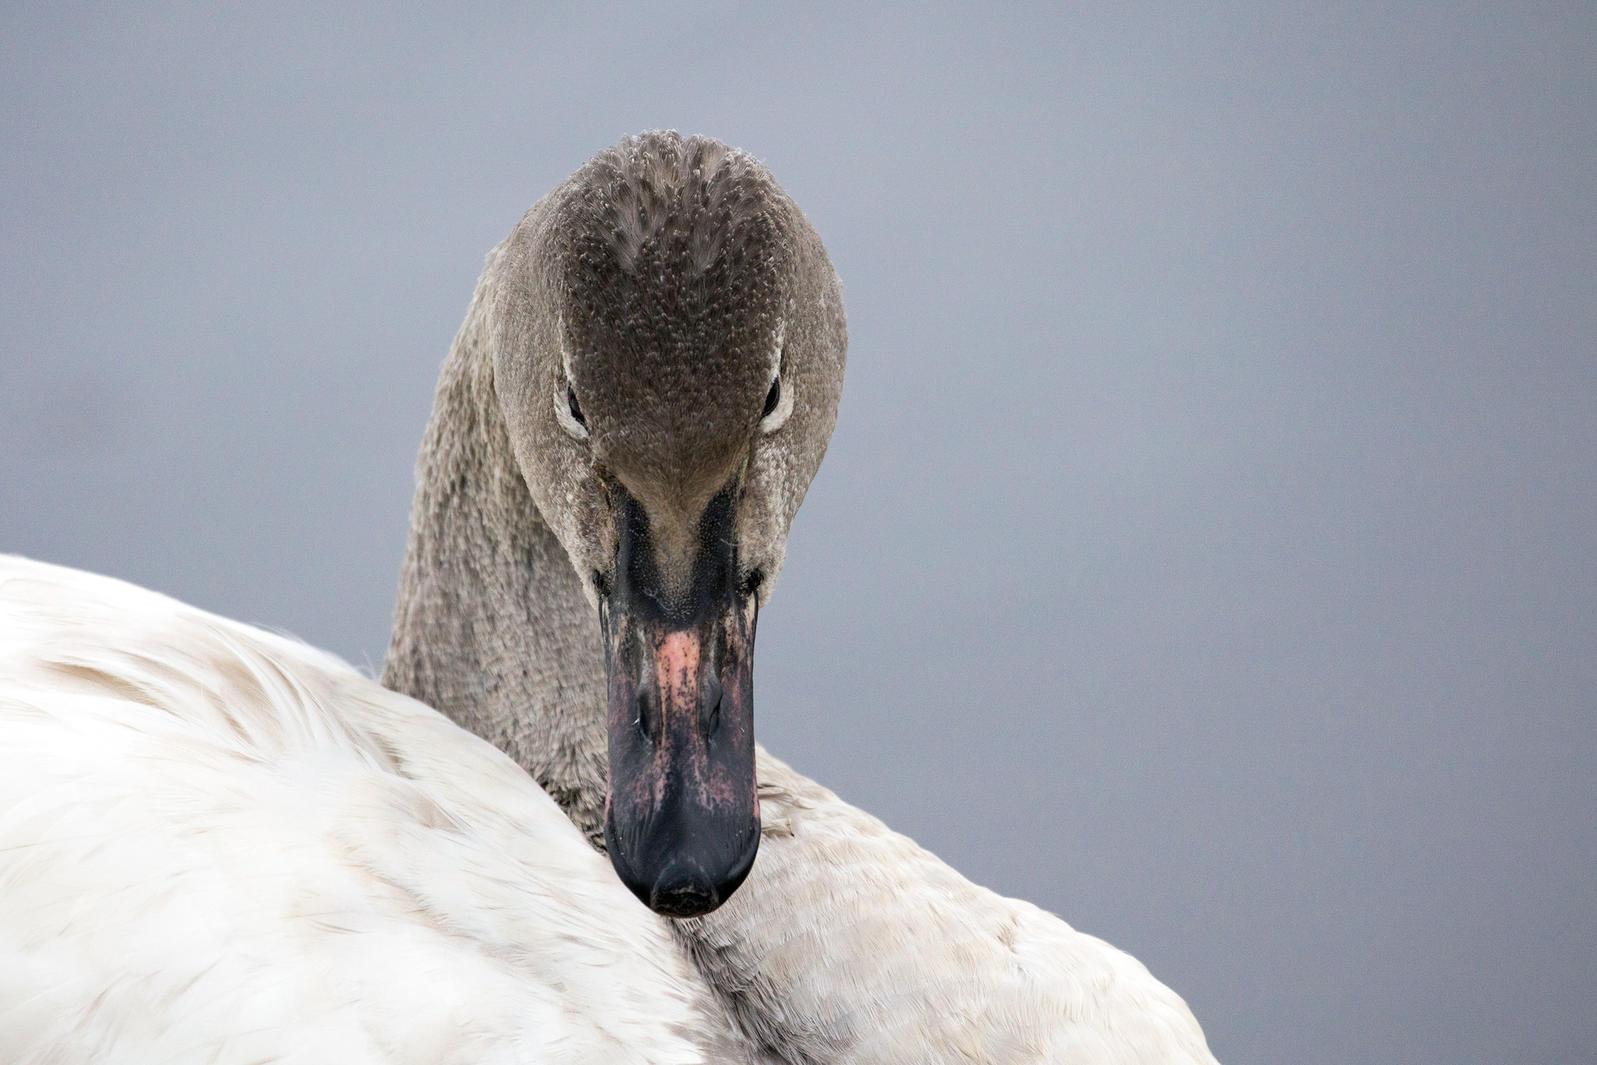 Tundra Swan. Beth Diggs/Audubon Photography Awards